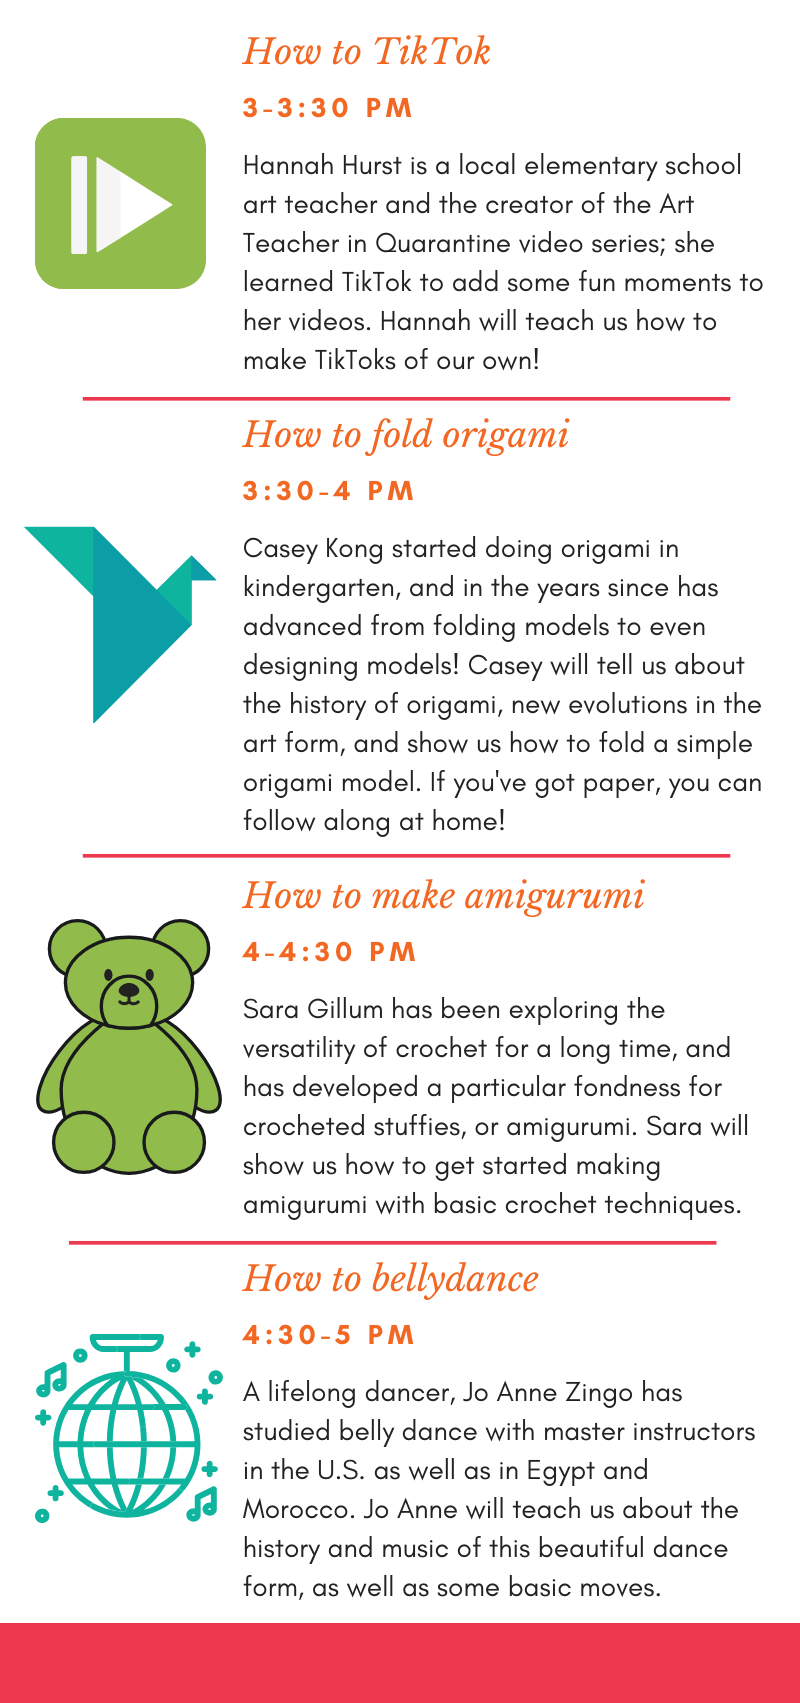 <p>Jun 20 Saturday Schedule  1:00 — Keep houseplants alive  1:30 — Brew beer at home  2:00 — Make rag rugs  2:30 — Yo-Yo  3:00 — TikTok  3:30 — Fold origami  4:00 — Crochet arigurumi  4:30 — Belly dance</p>